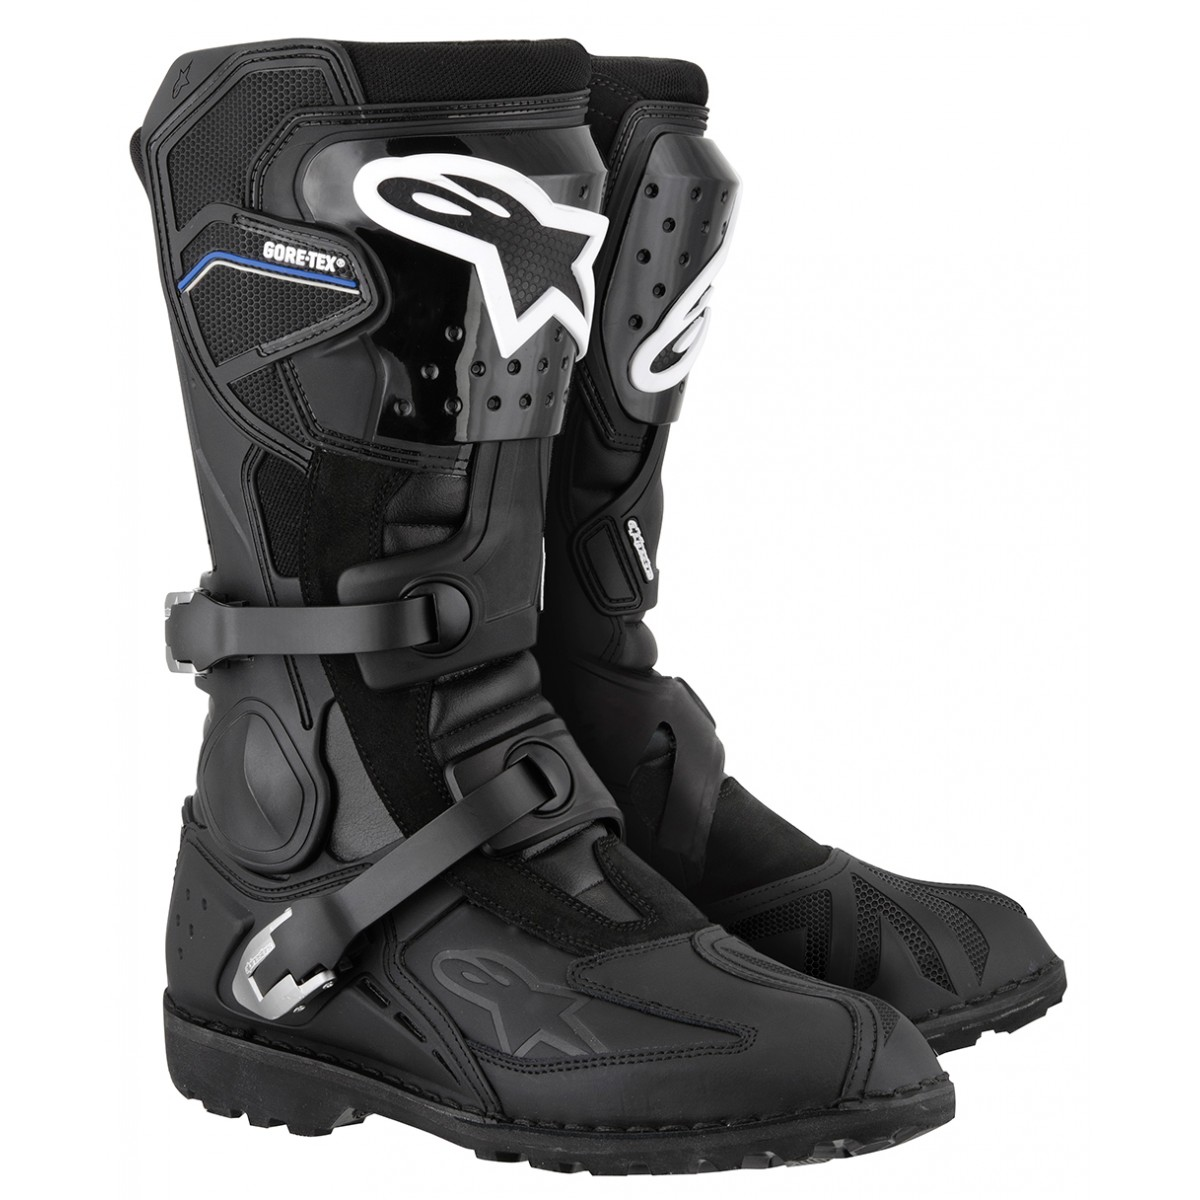 Bota Alpinestars Toucan Gore-Tex® XCR  (Impermeável)  - Super Bike - Loja Oficial Alpinestars